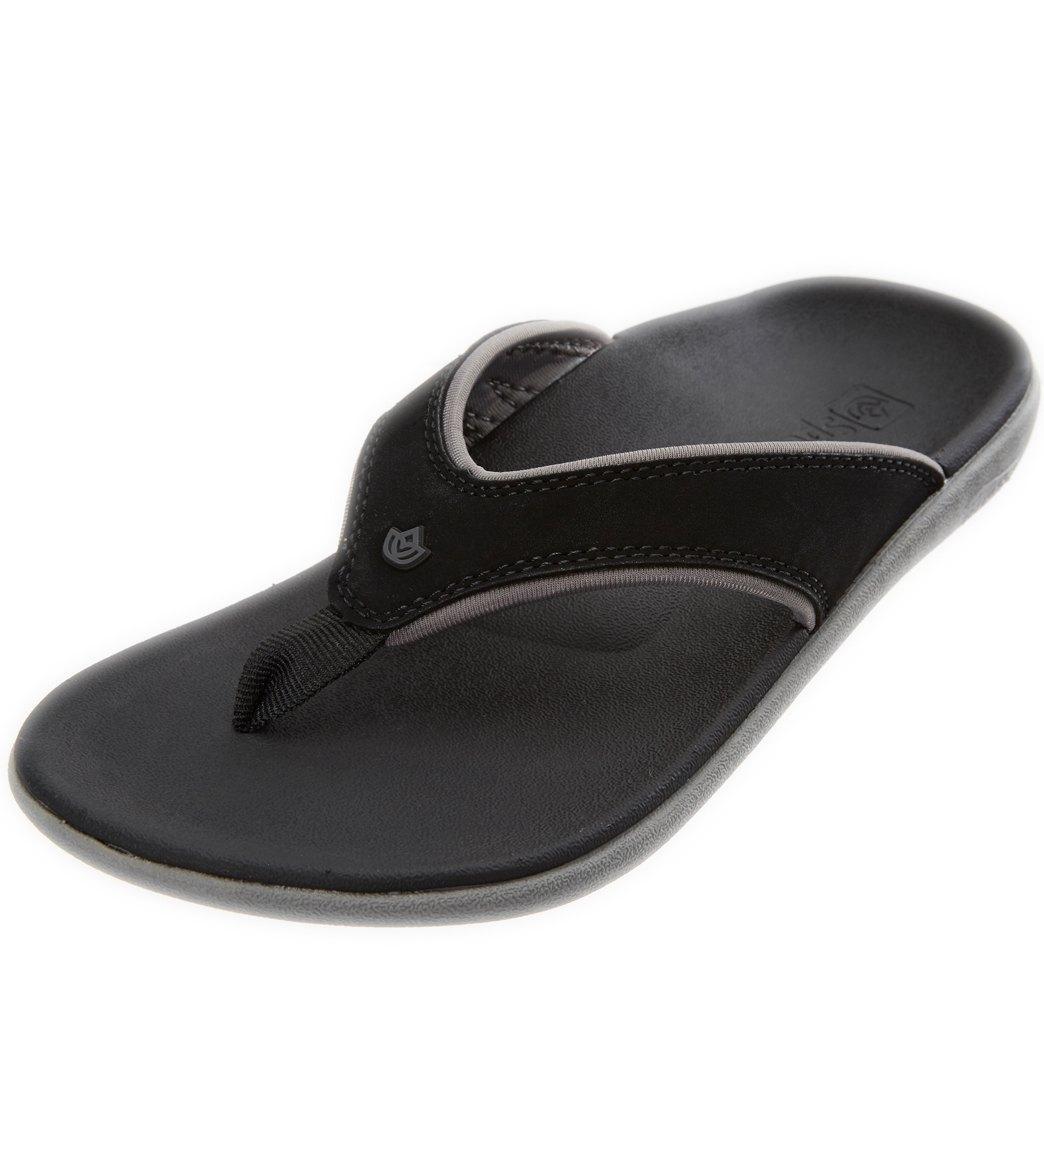 1b5f9b513bf4 Spenco Women s Yumi Plus Flip Flop at SwimOutlet.com - Free Shipping